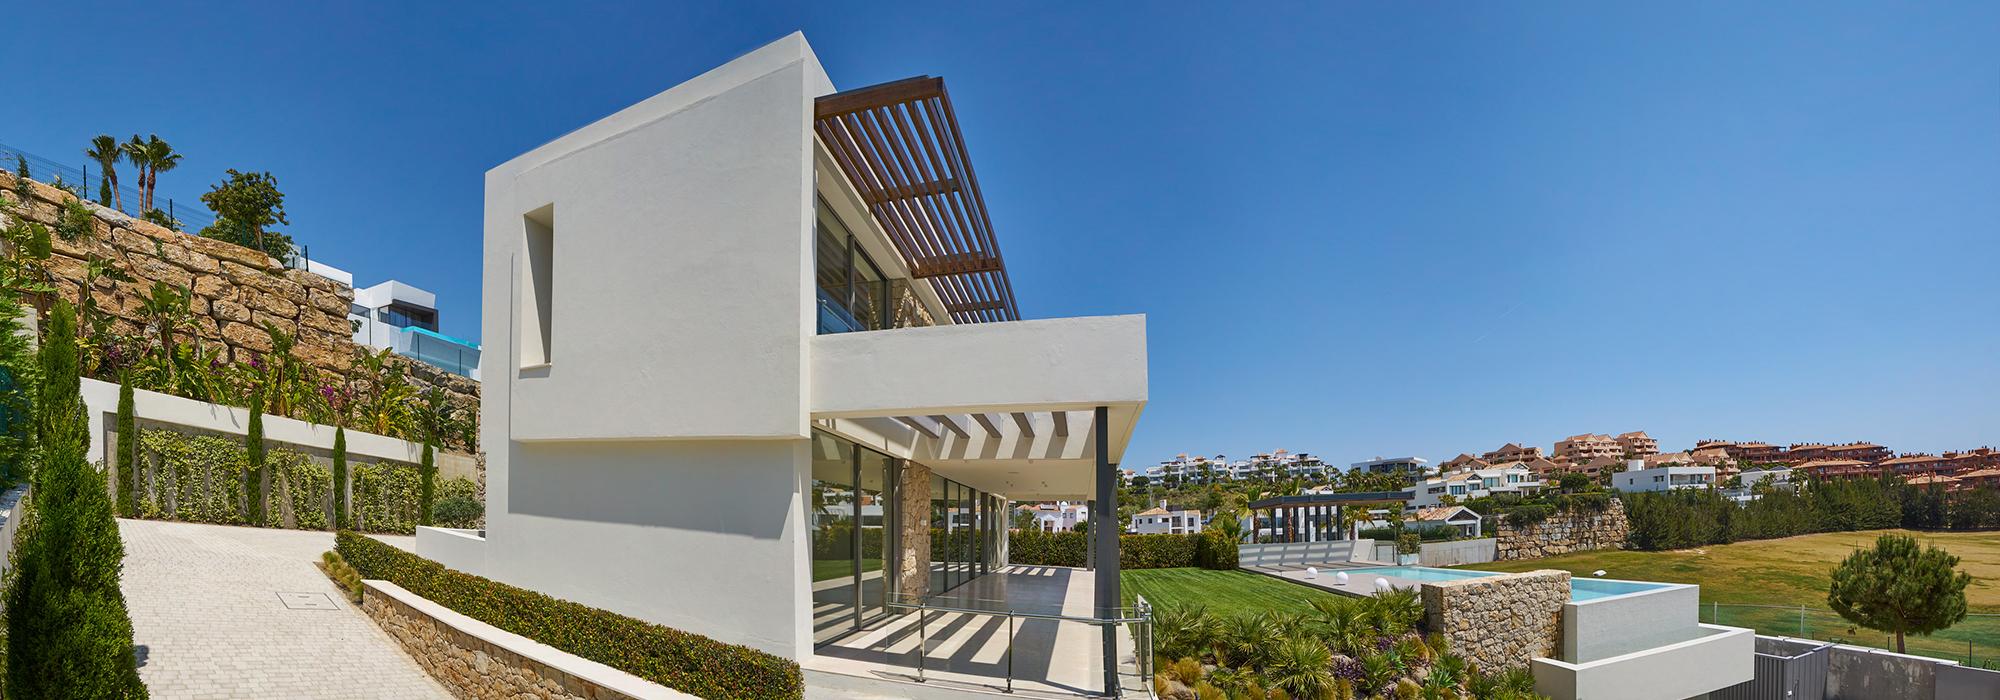 New Contemporary Villa with Golf Views in Benahavis